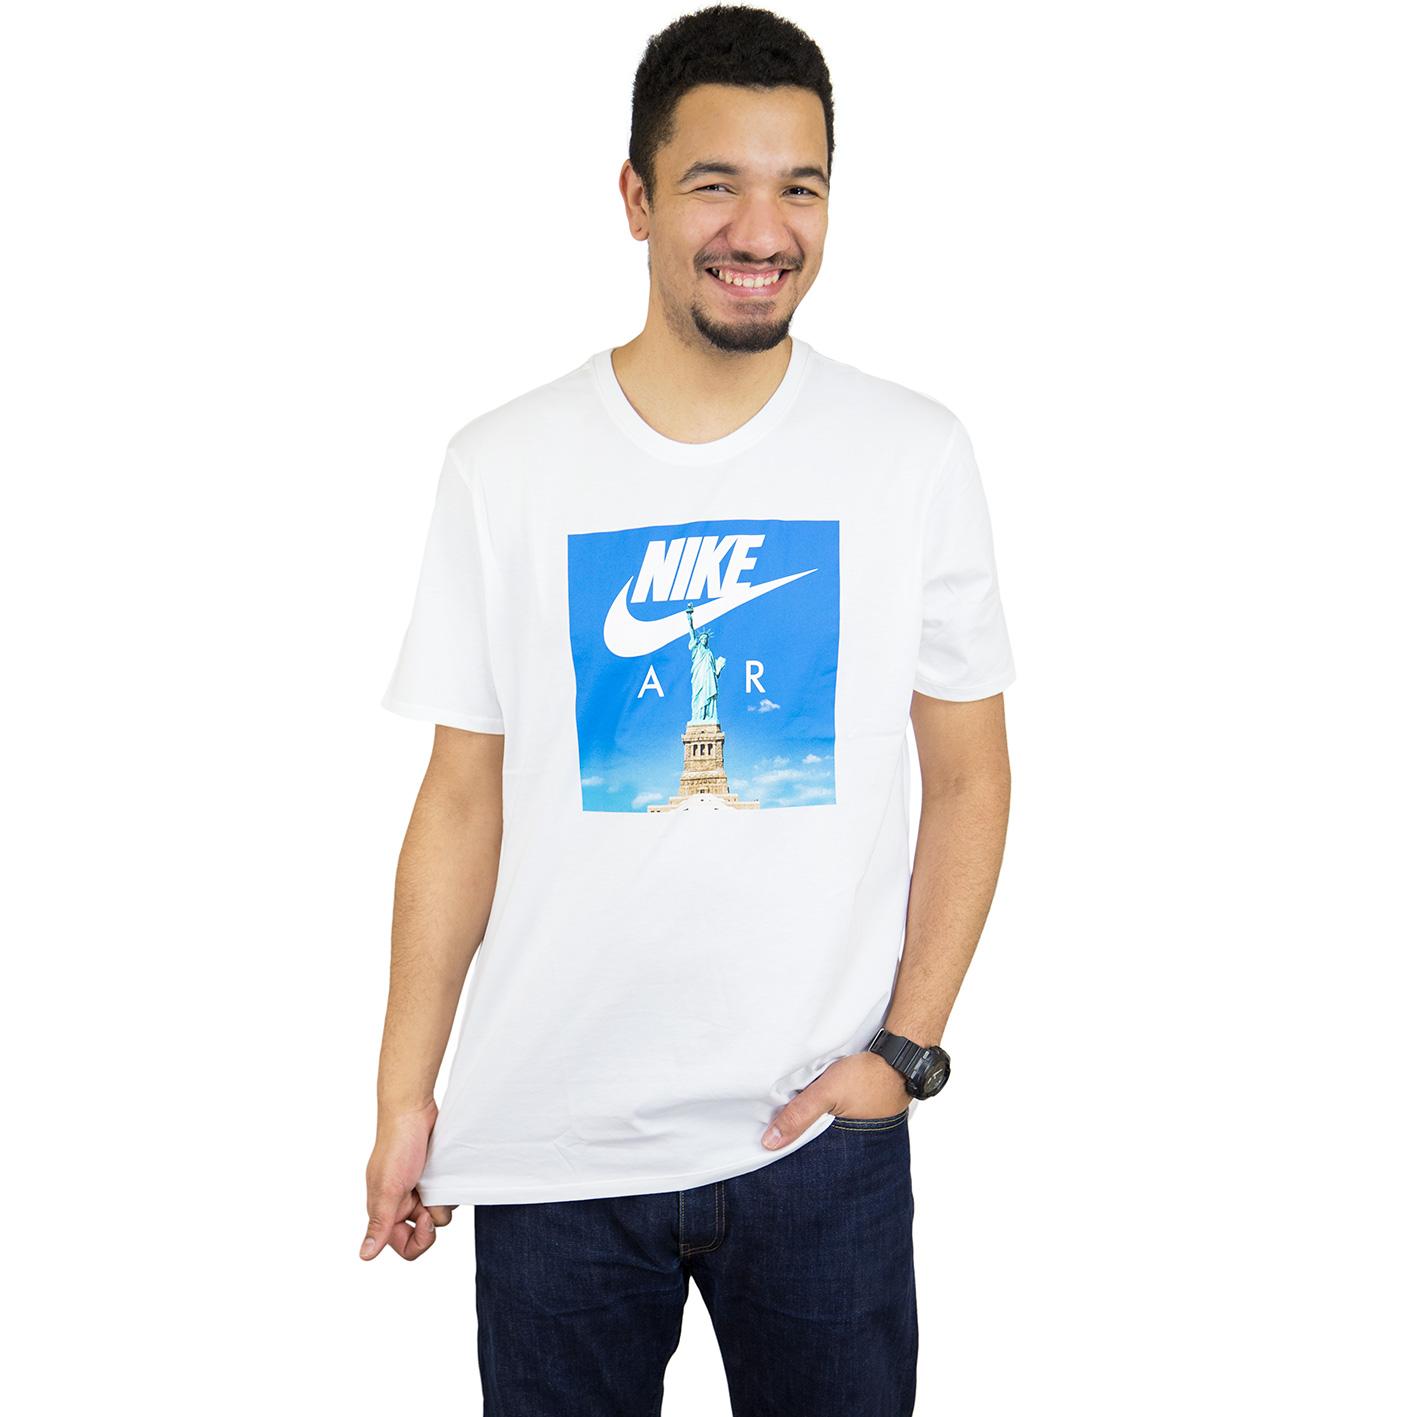 Nike Air 1 Weiß Blau T Shirt Herren